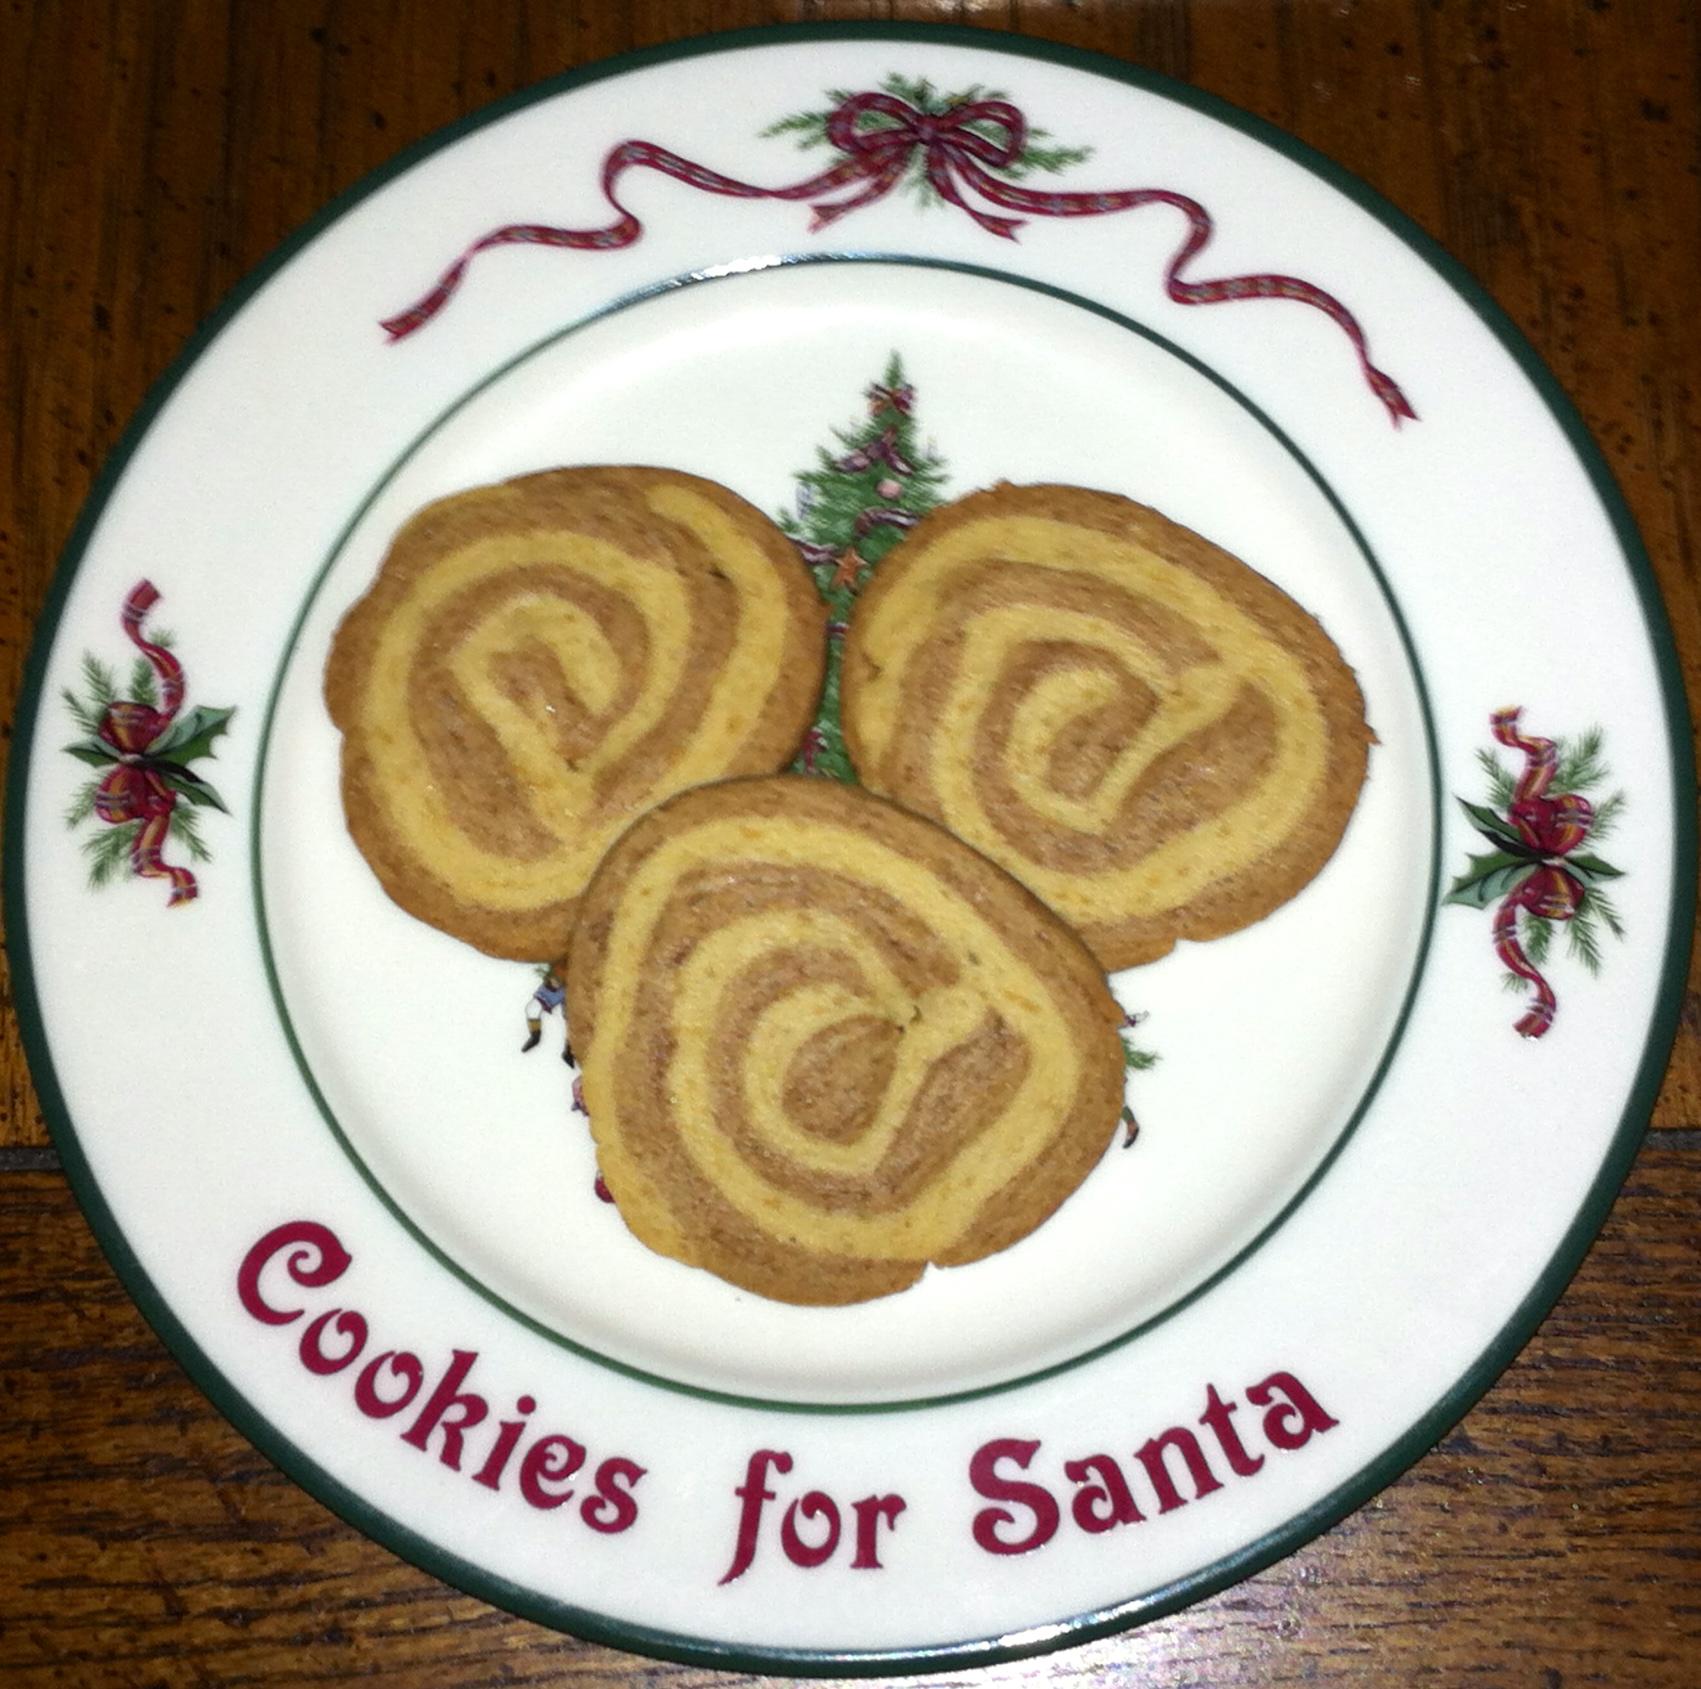 Nana's Ice Box Cookies